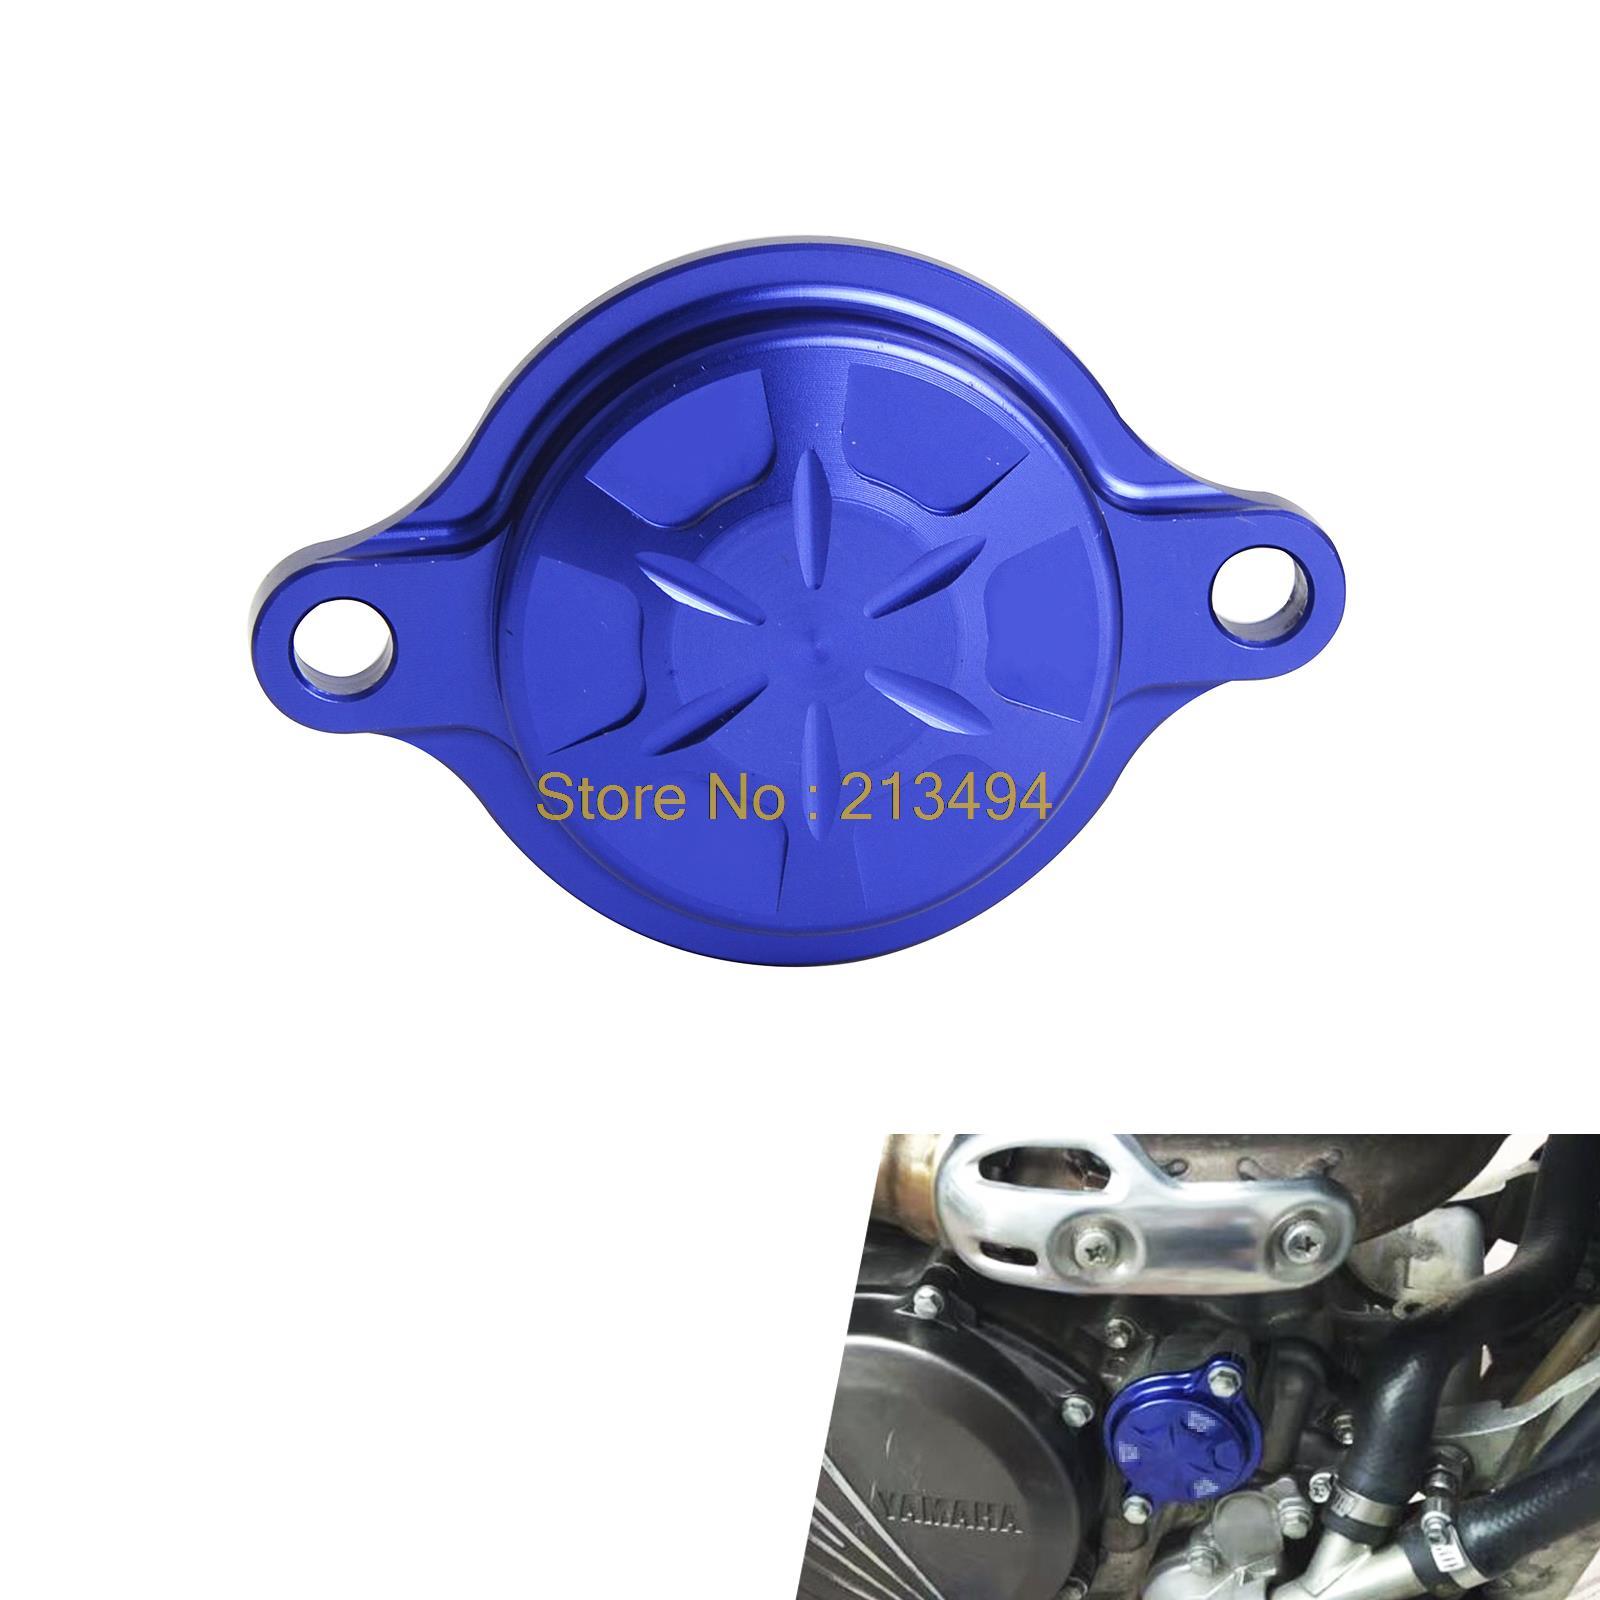 Blue CNC Billet Oil Filter Cover For Yamaha WR250F 2015 2016 WR450F YZ450FX  2016 meziere wp101b sbc billet elec w p